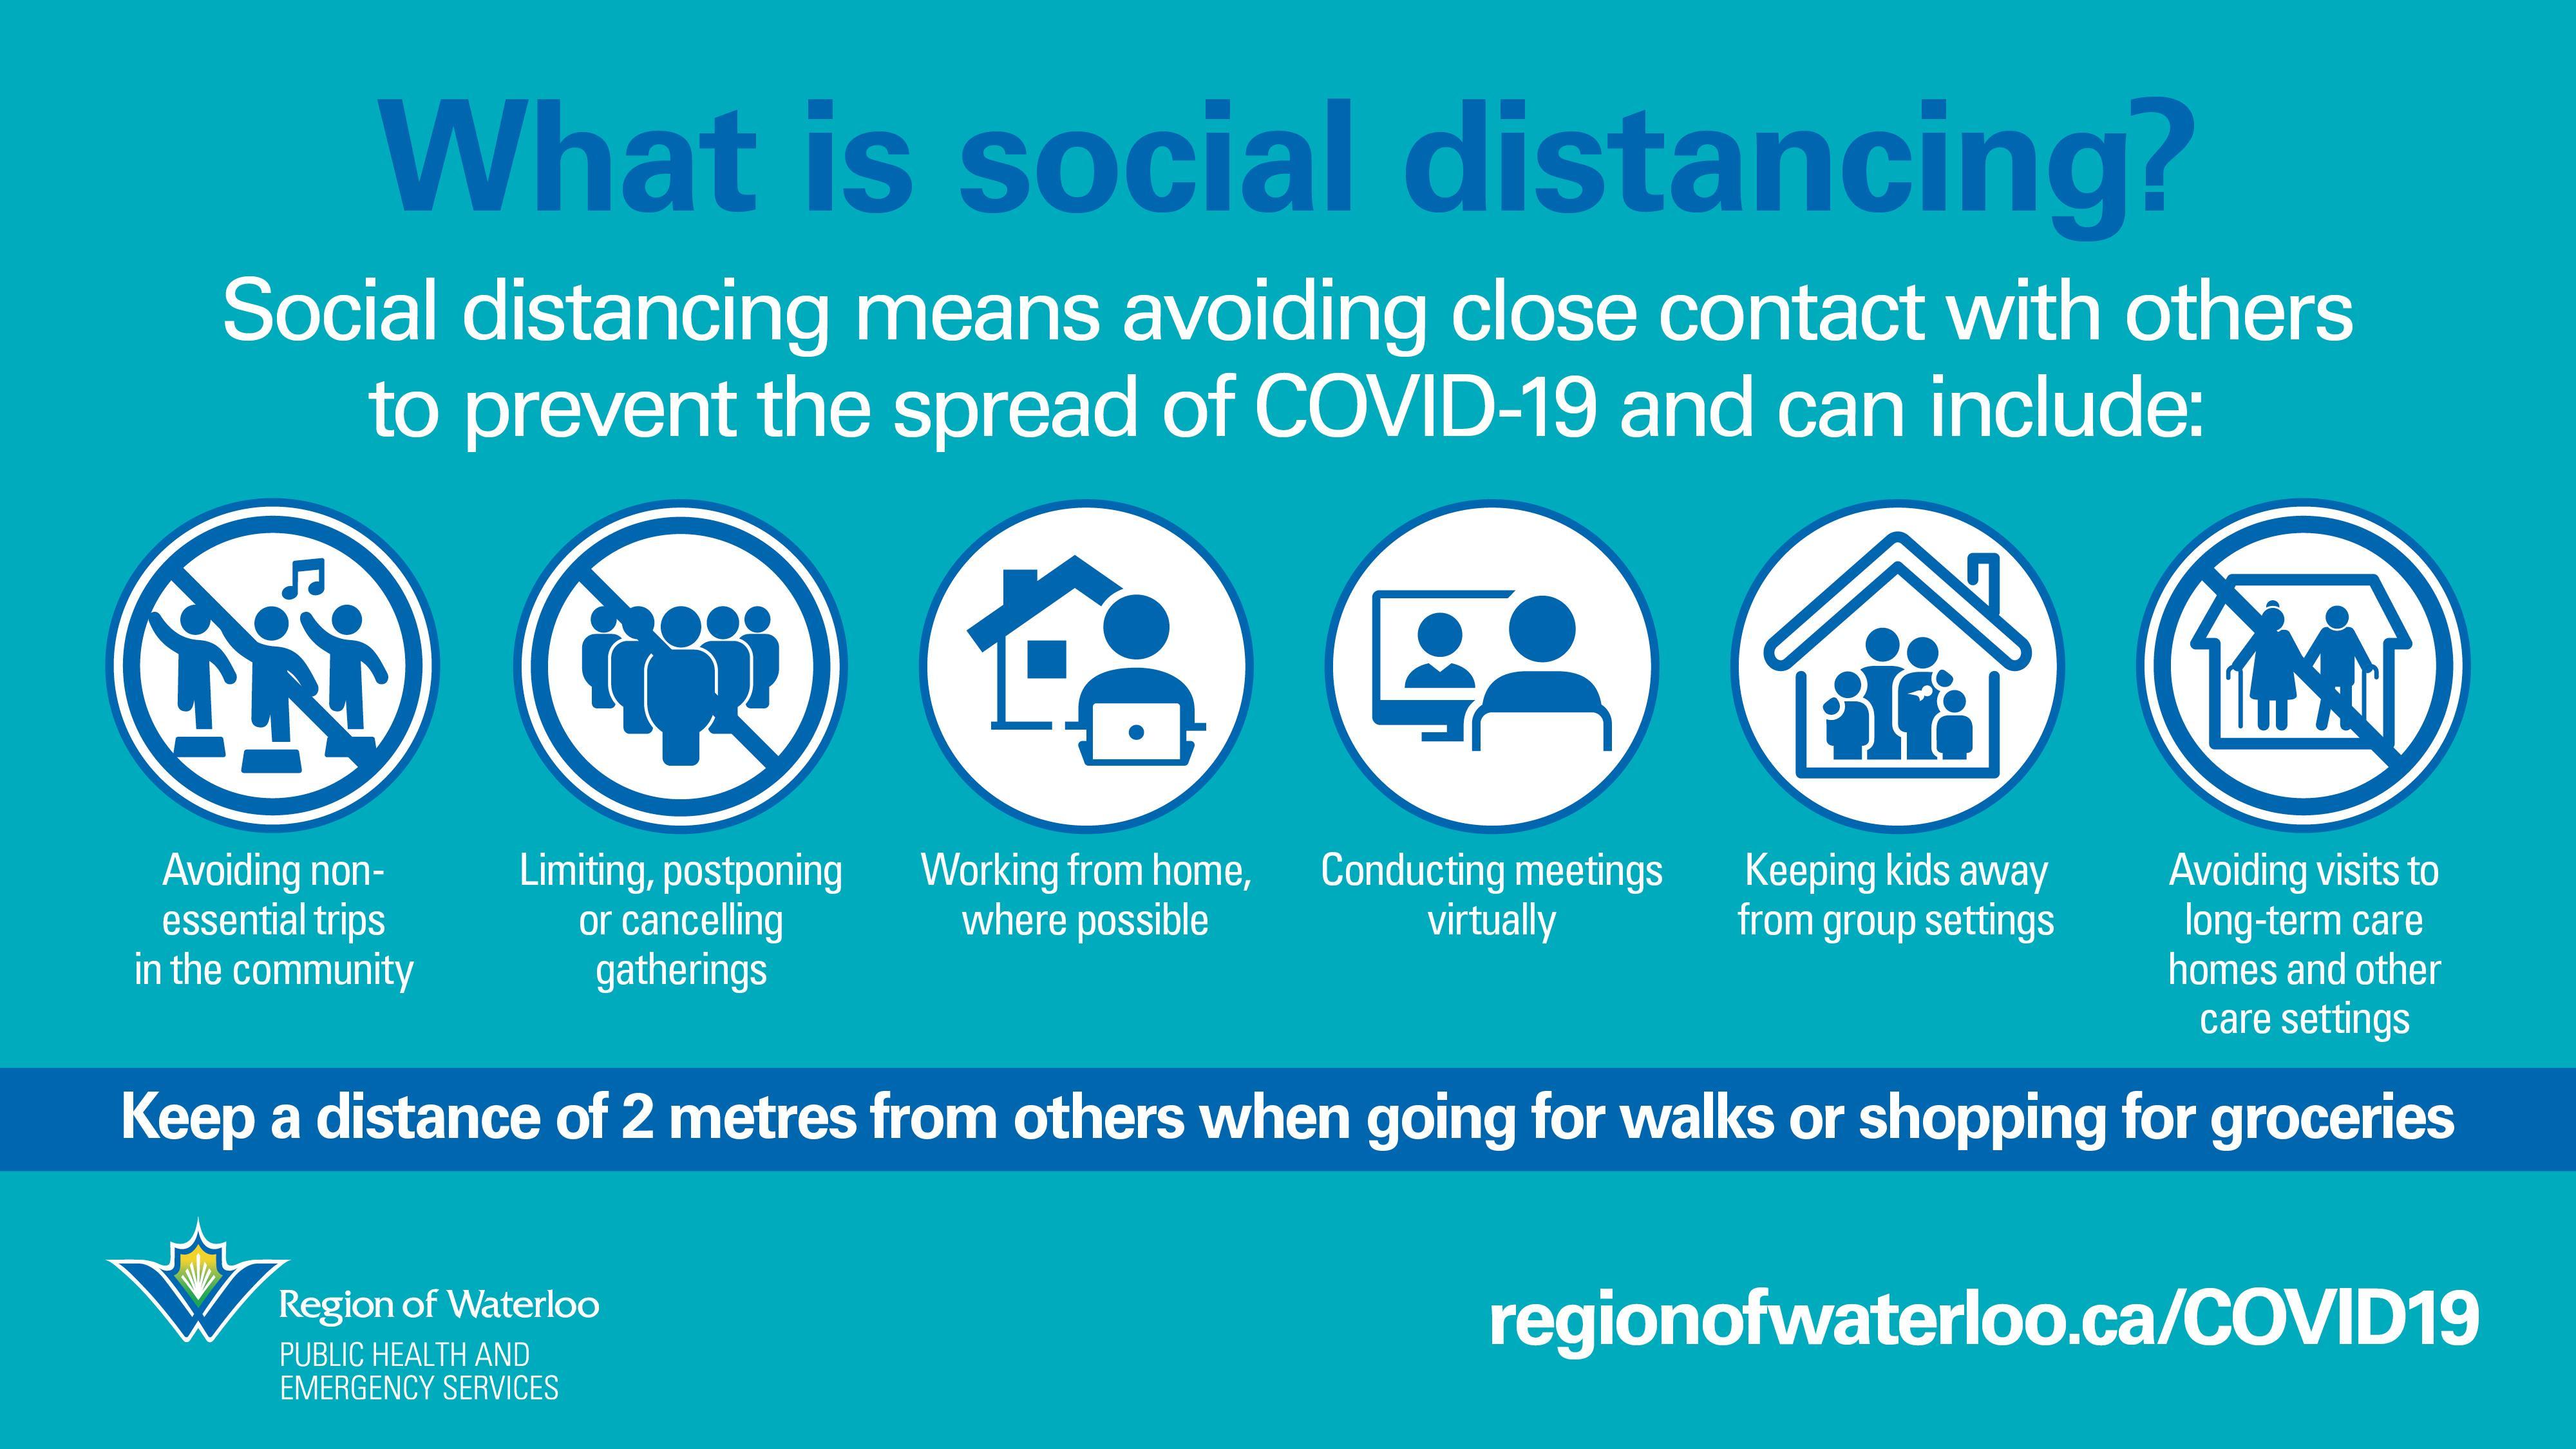 COVID-19 Social Distancing